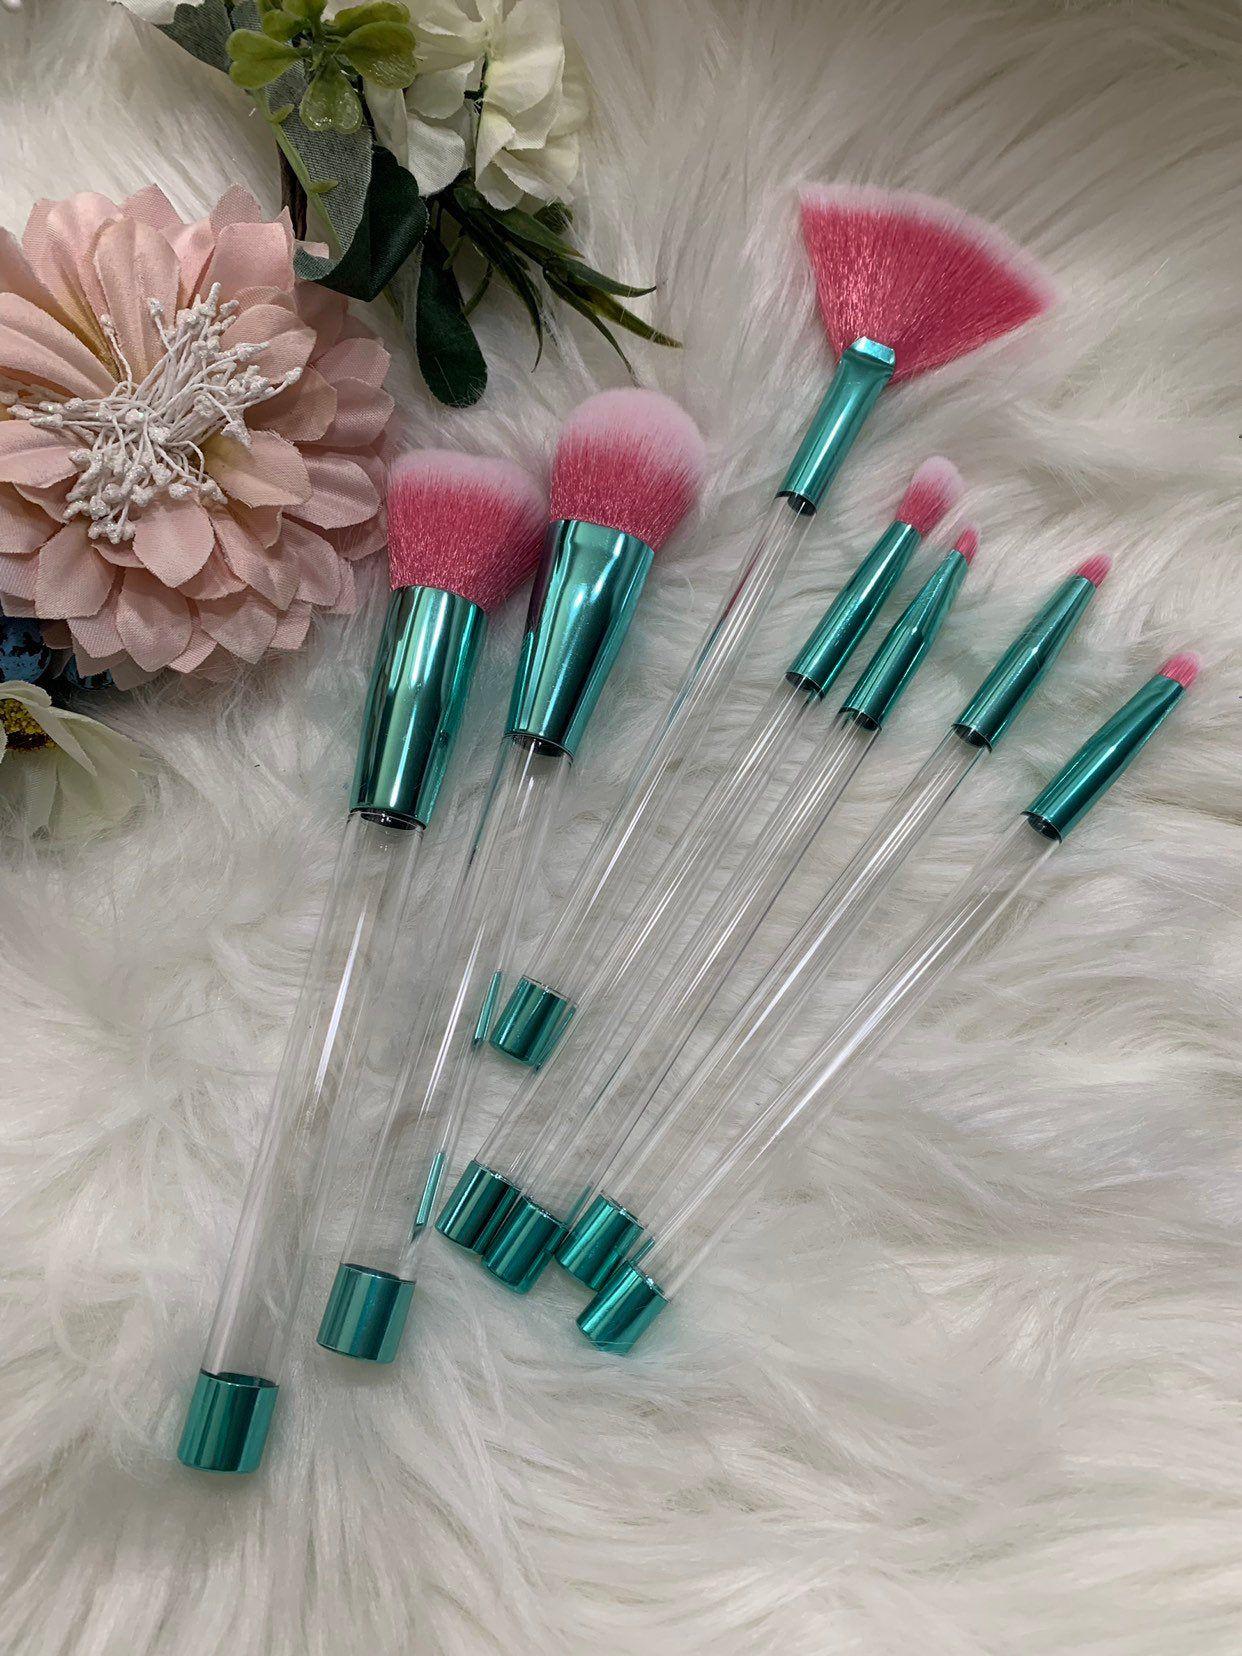 Blue Tip Pink Glitter Tubes Makeup Brush Set Pink